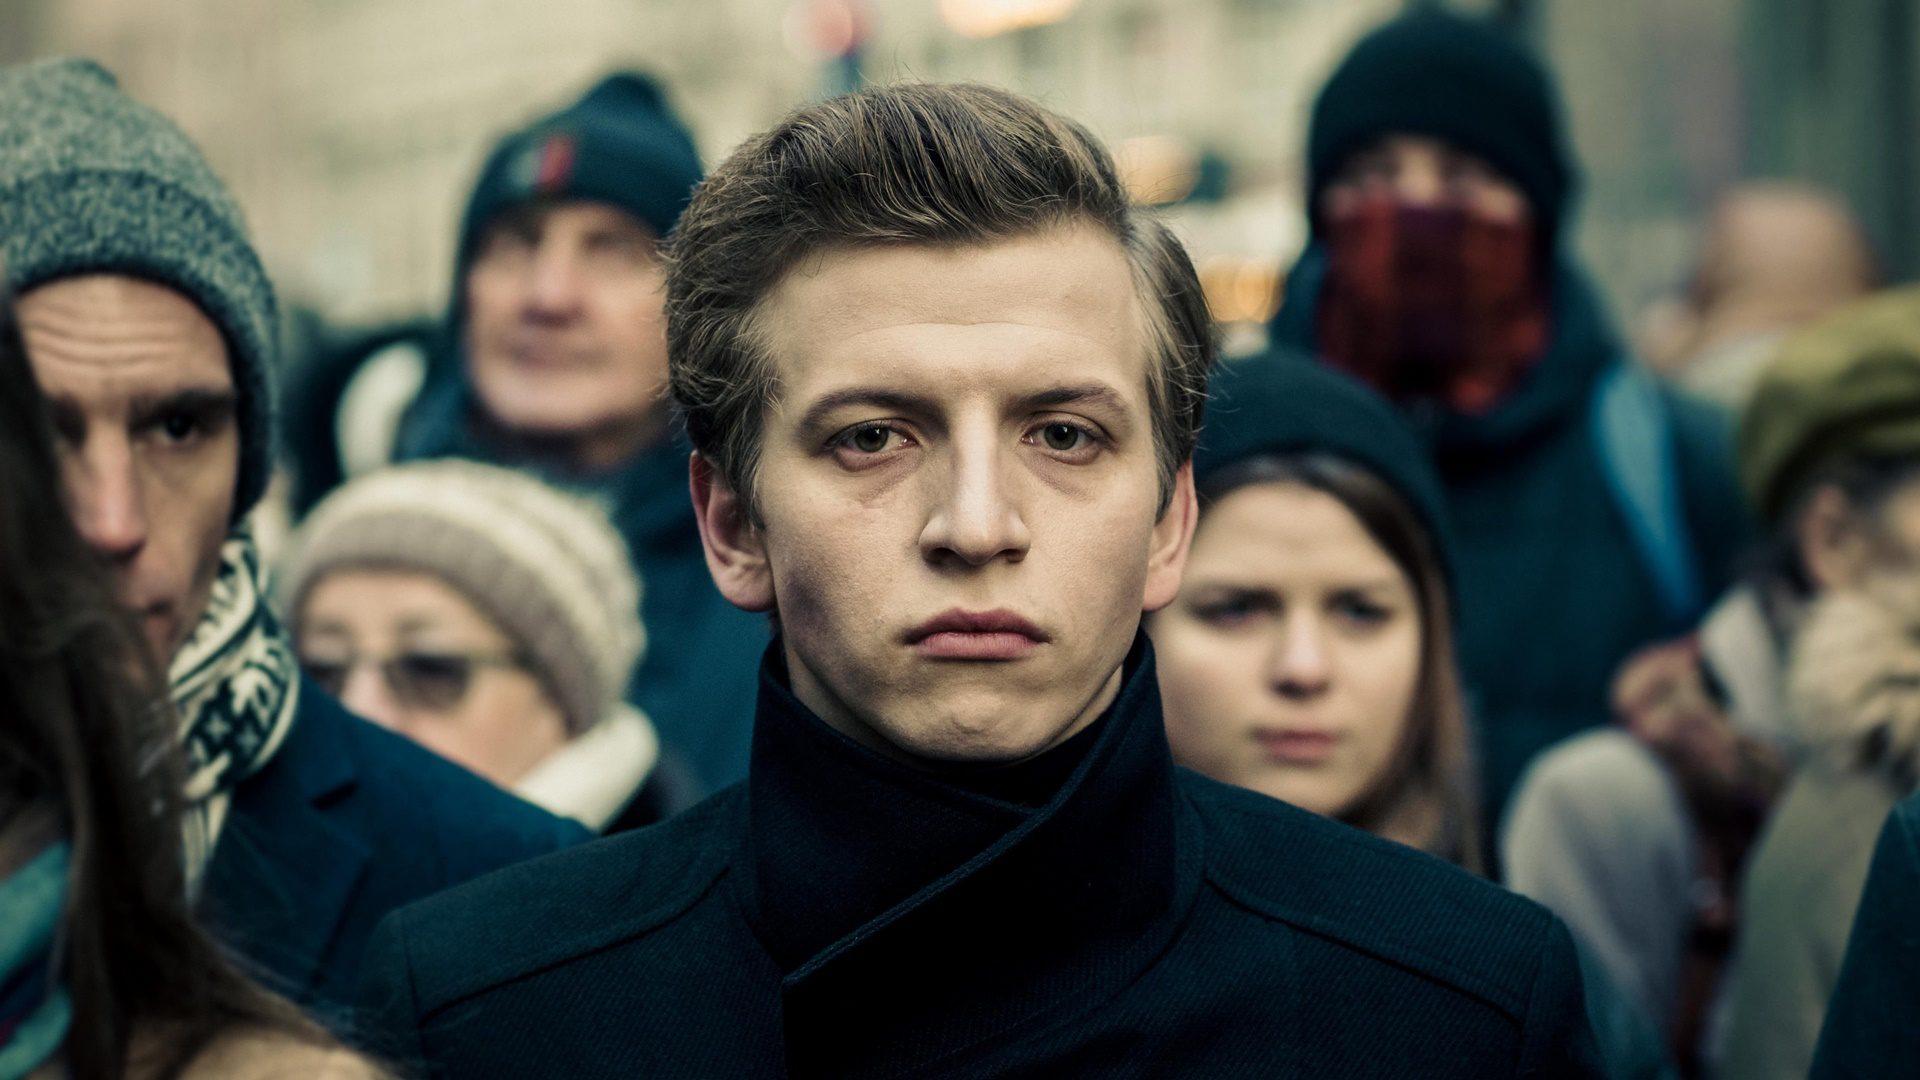 Hater, película, Netflix, fake news. ciberacoso, polonia, Maciej Musialowski